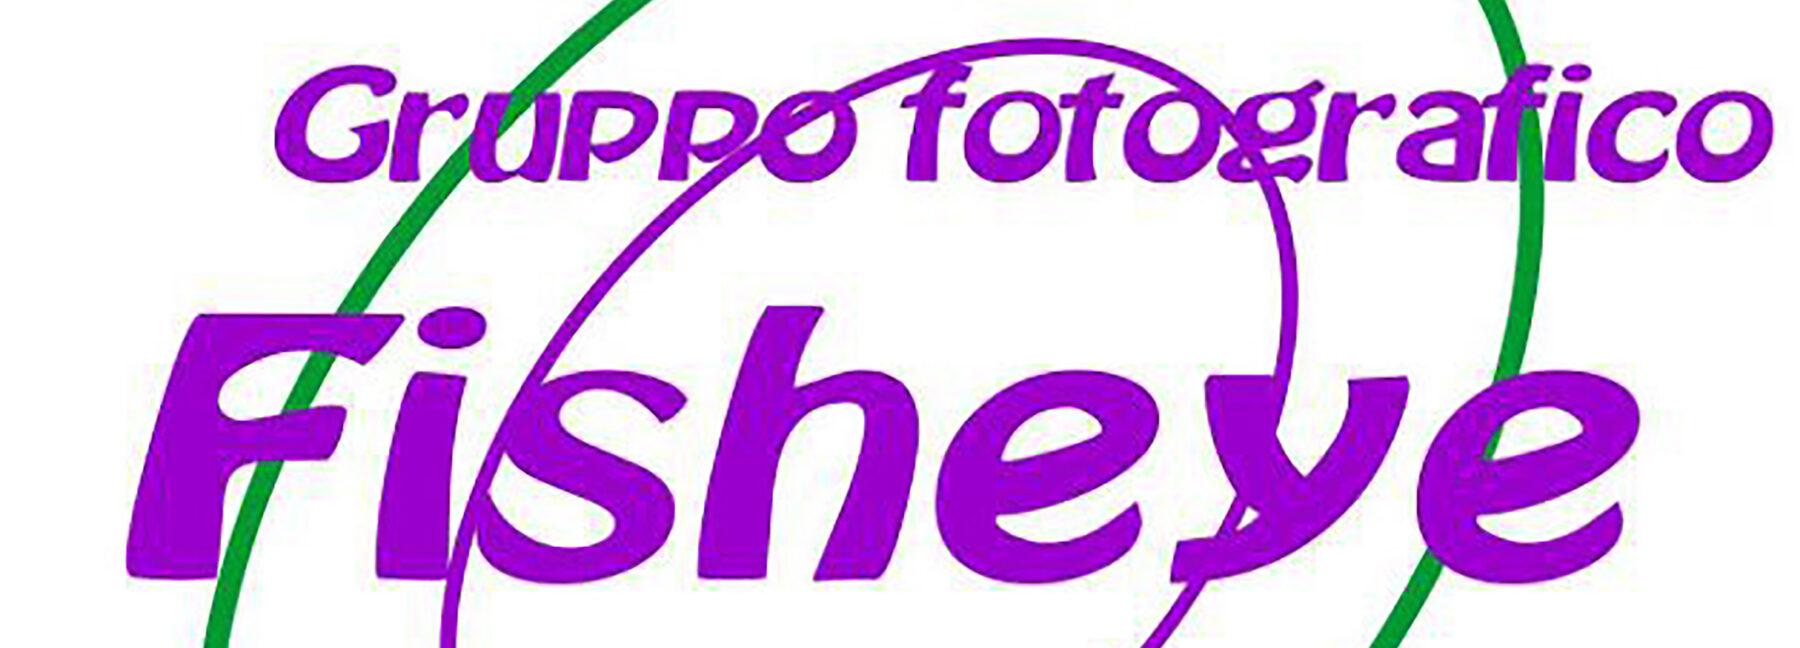 Gruppo Fotografico Fisheye